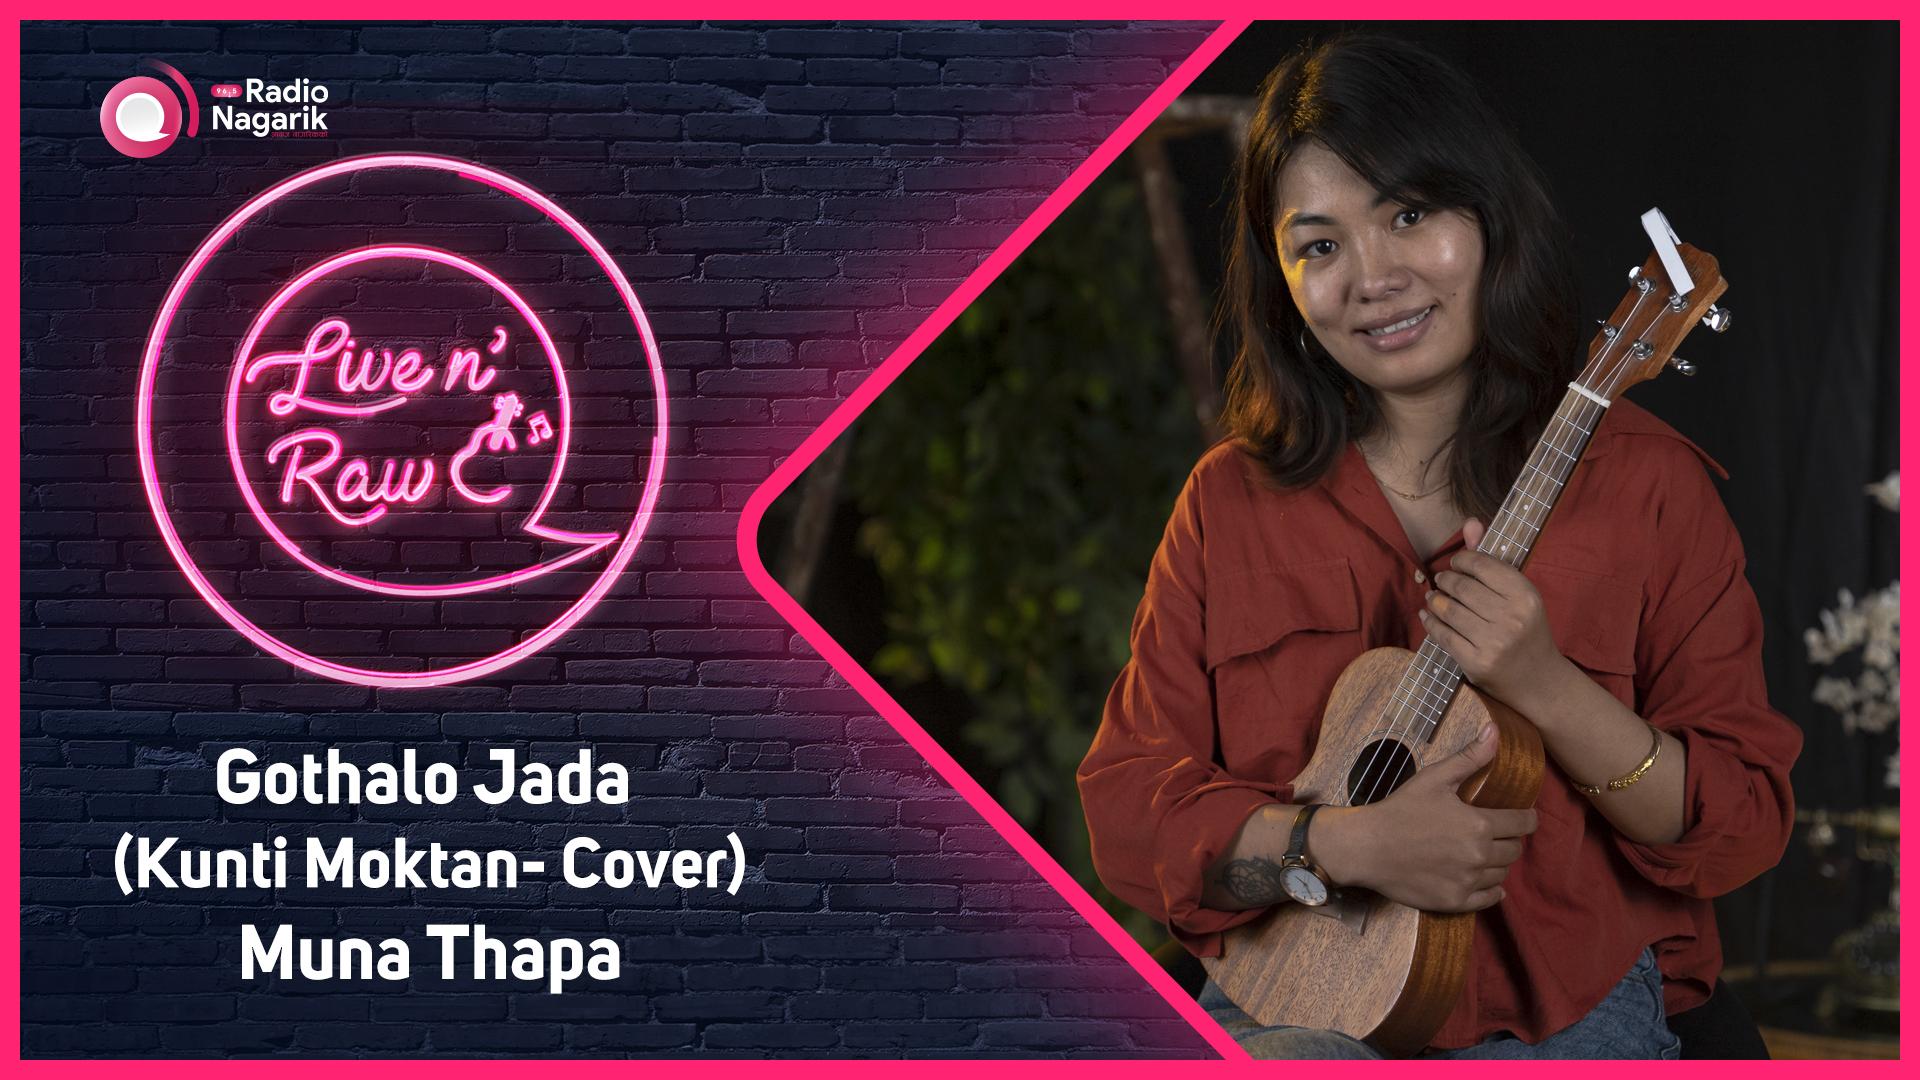 Muna Thapa - Gothalo Jada ( Kunti Moktan - Cover ) / Live N' Raw